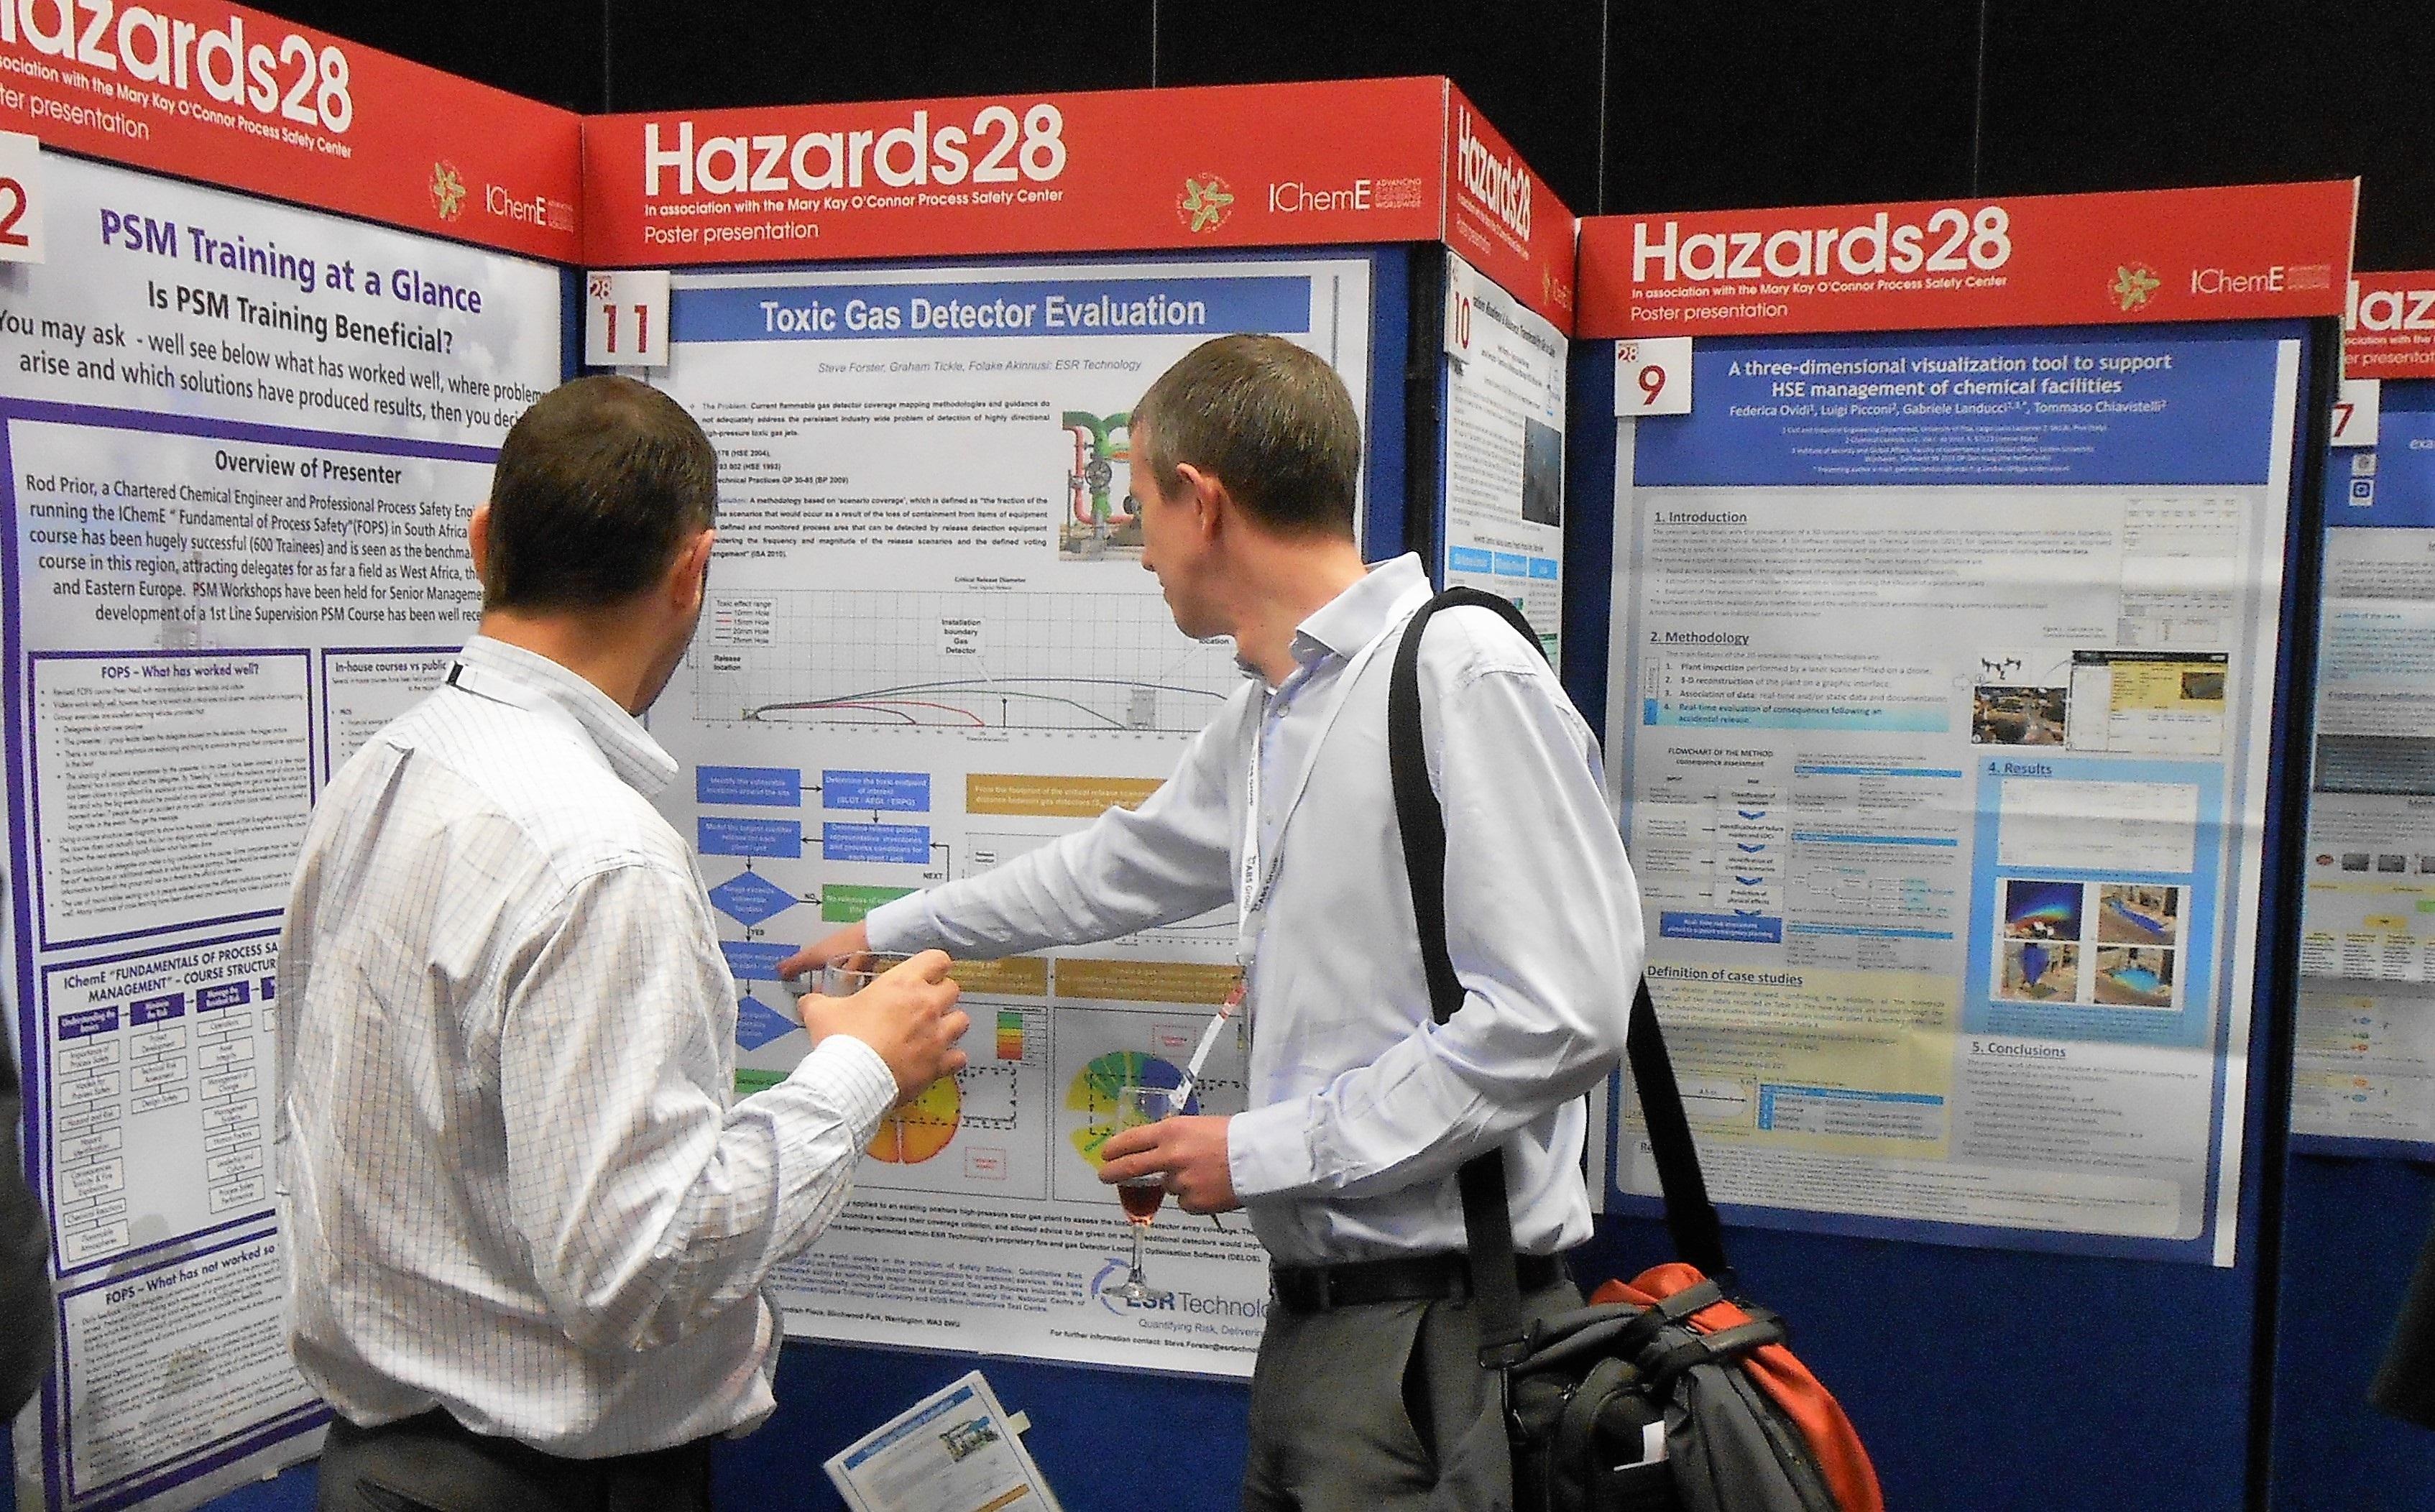 Exhibition Stand Evaluation : Esr technology presents at hazards